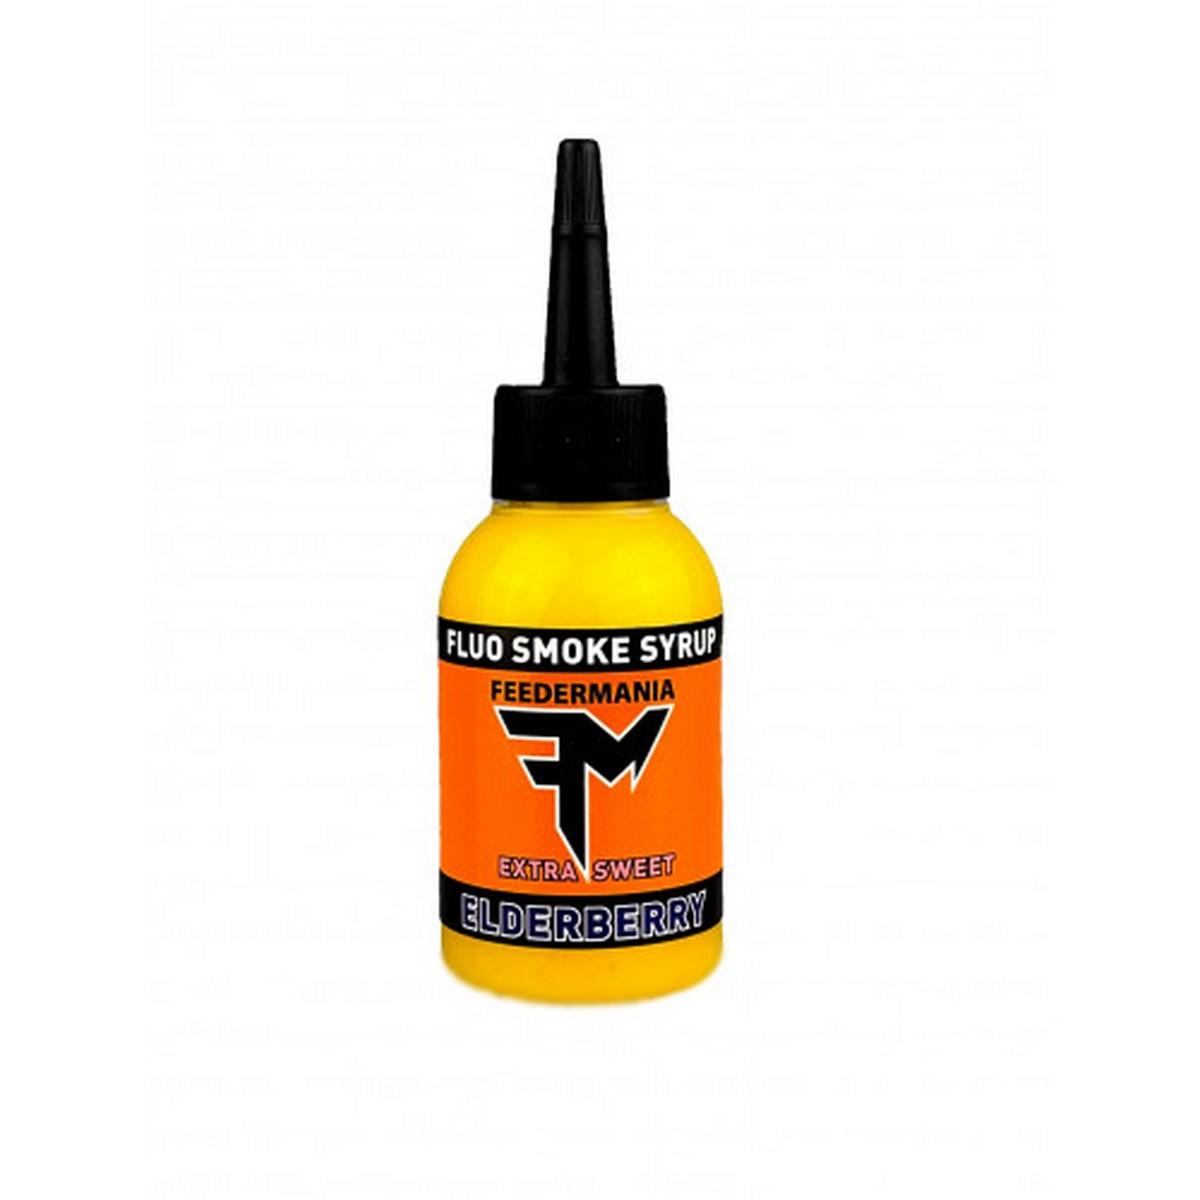 FLUO SMOKE SYRUP ELDERBERRY 75 ML